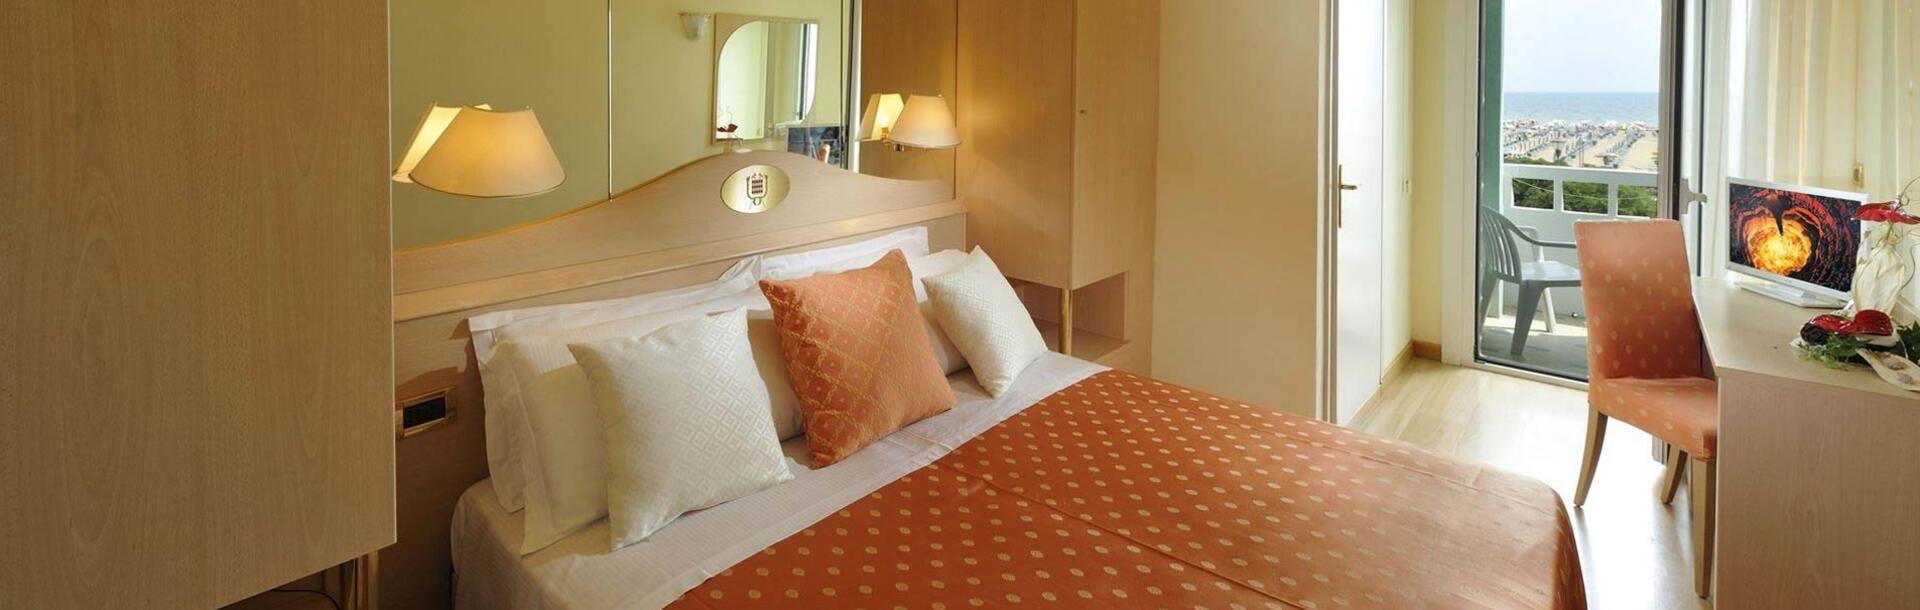 hotel-montecarlo it economy-room-bibione 013